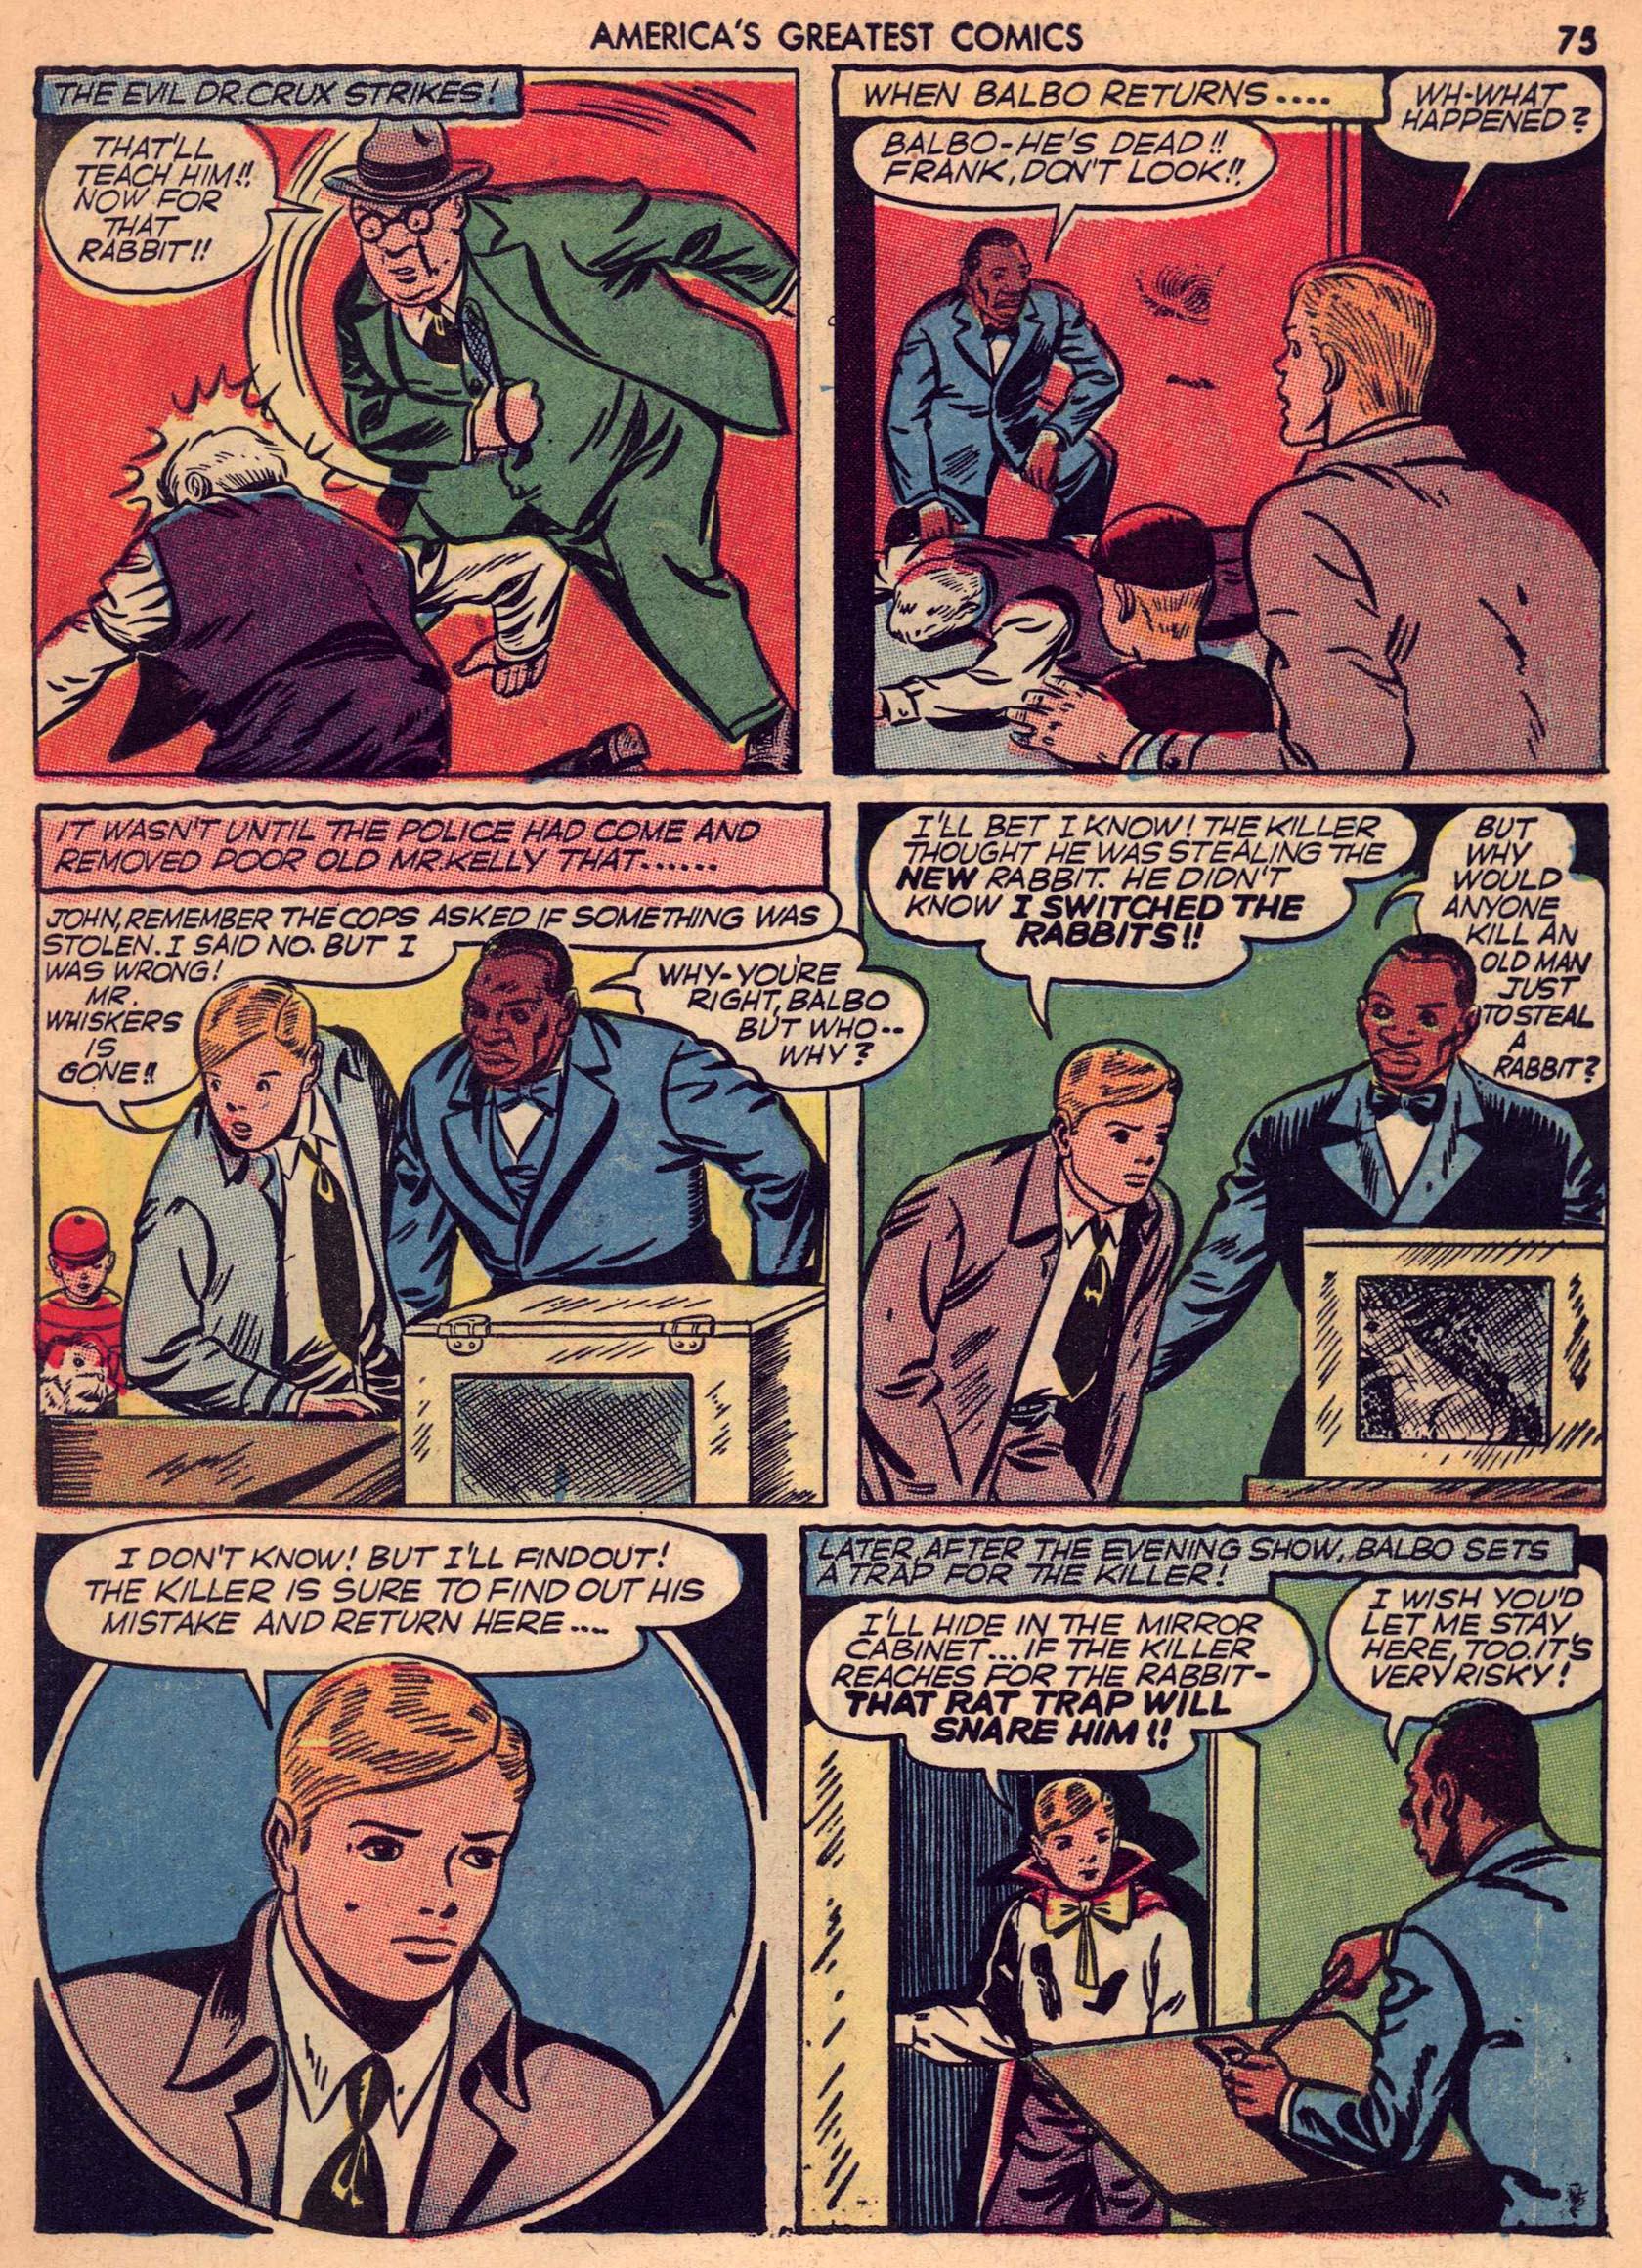 Read online America's Greatest Comics comic -  Issue #7 - 74